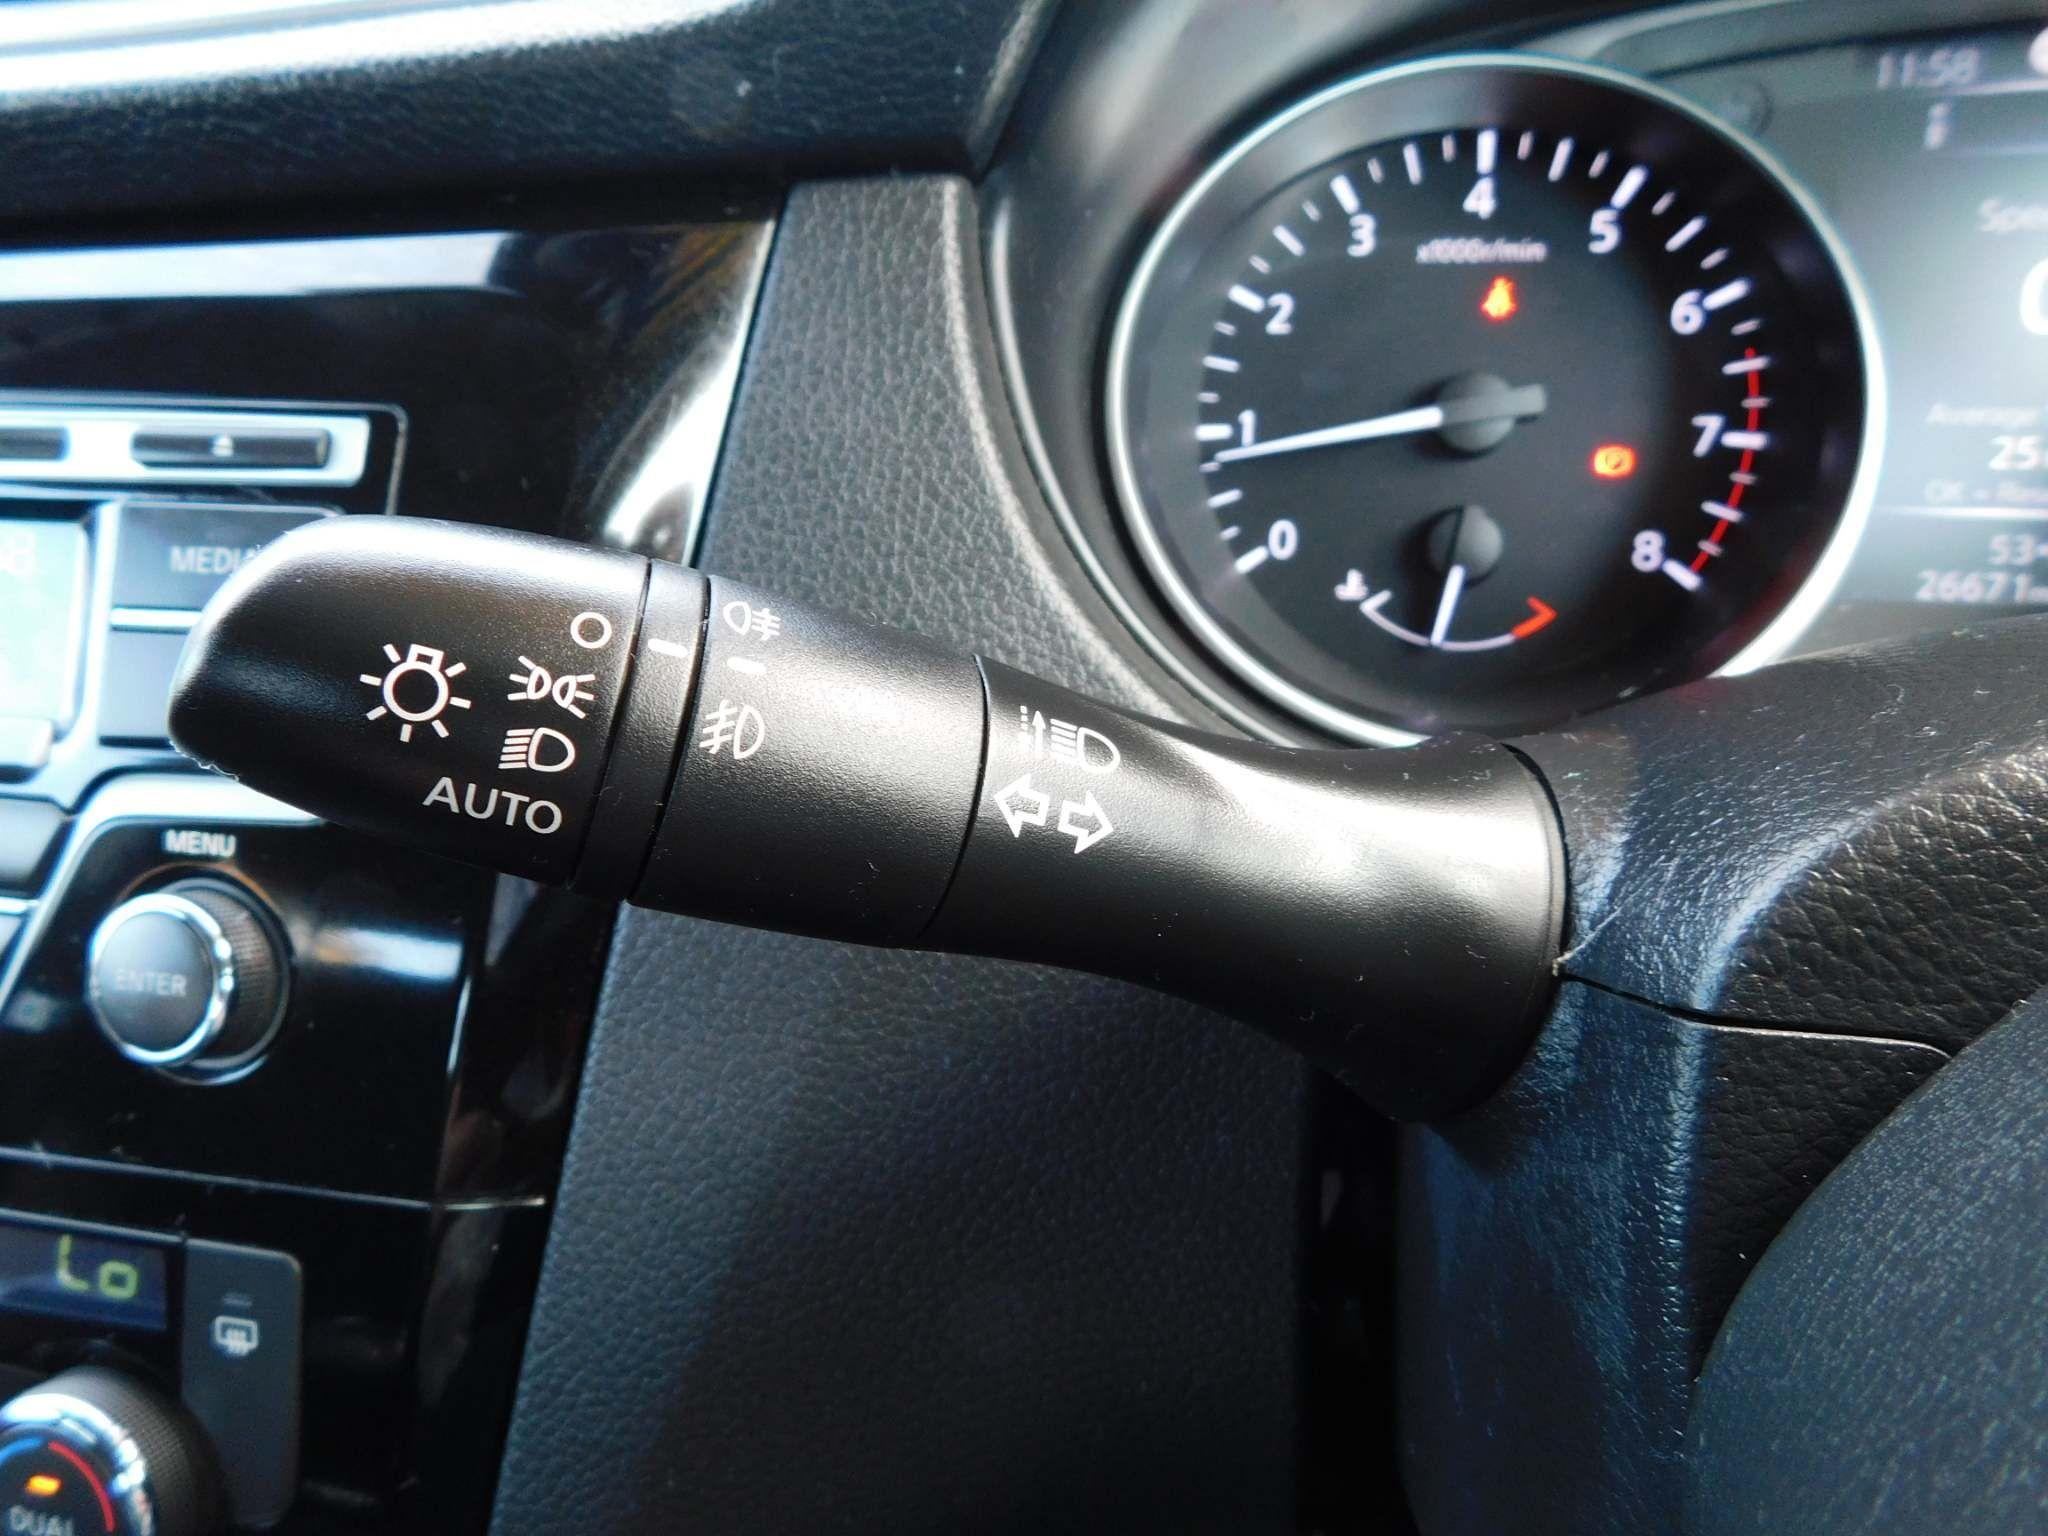 2017 NISSAN Qashqai 1.2 DIG-T Acenta (s/s) Petrol Manual due in – Meadow Cars Carrickfergus full